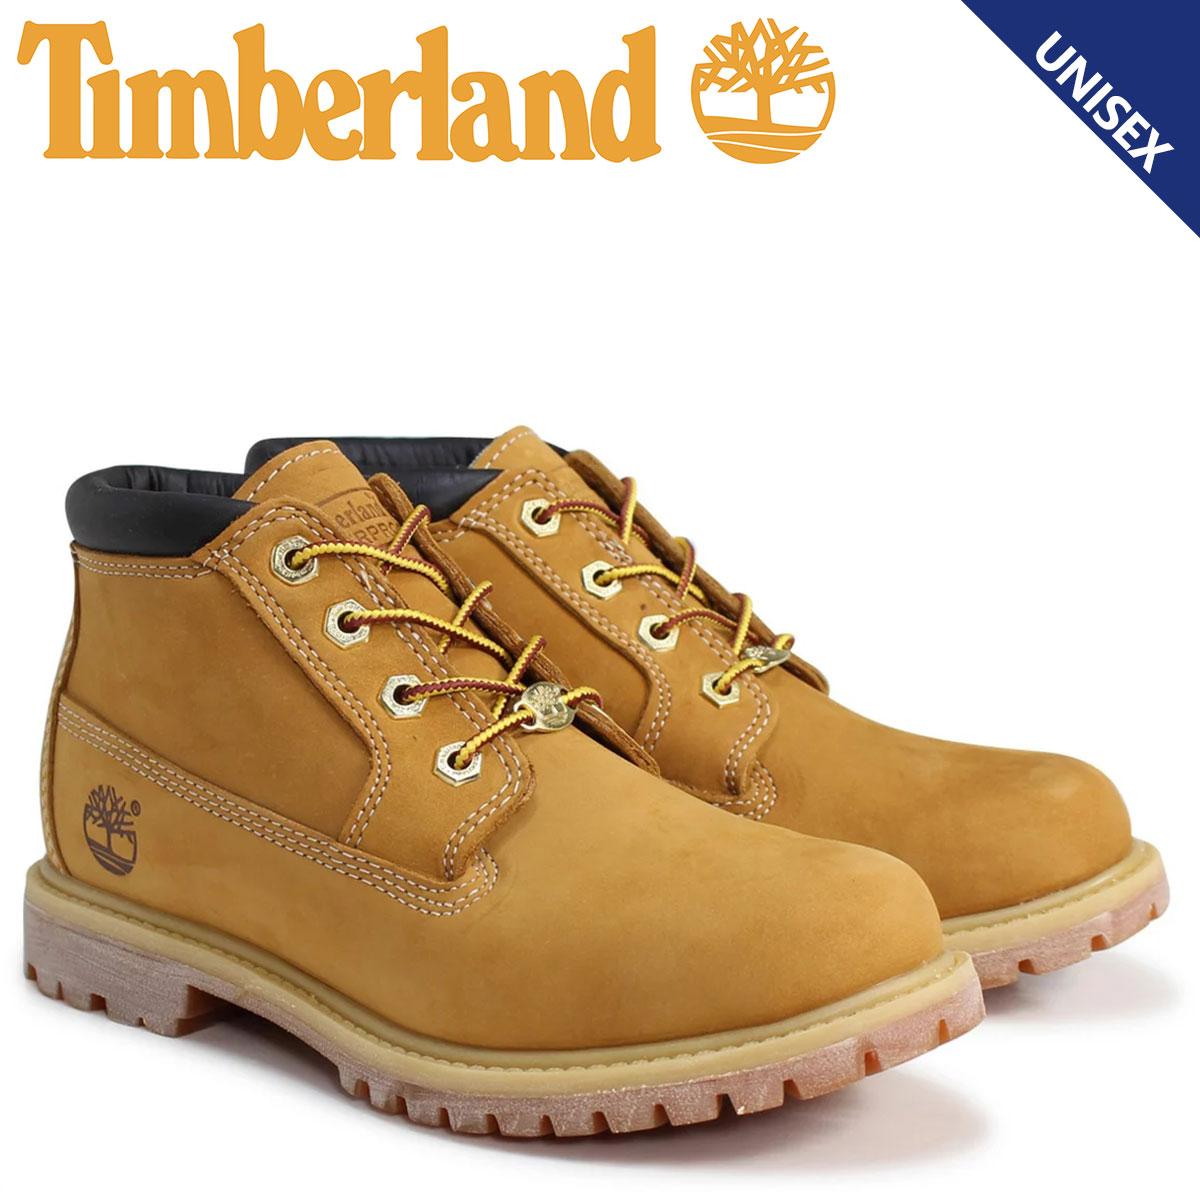 Timberland ティンバーランド チャッカ ブーツ レディース メンズ NELLIE CHUKKA DOUBLE WATERPLOOF BOOTS Wワイズ 防水 ウィート 23399 [3/19 追加入荷]